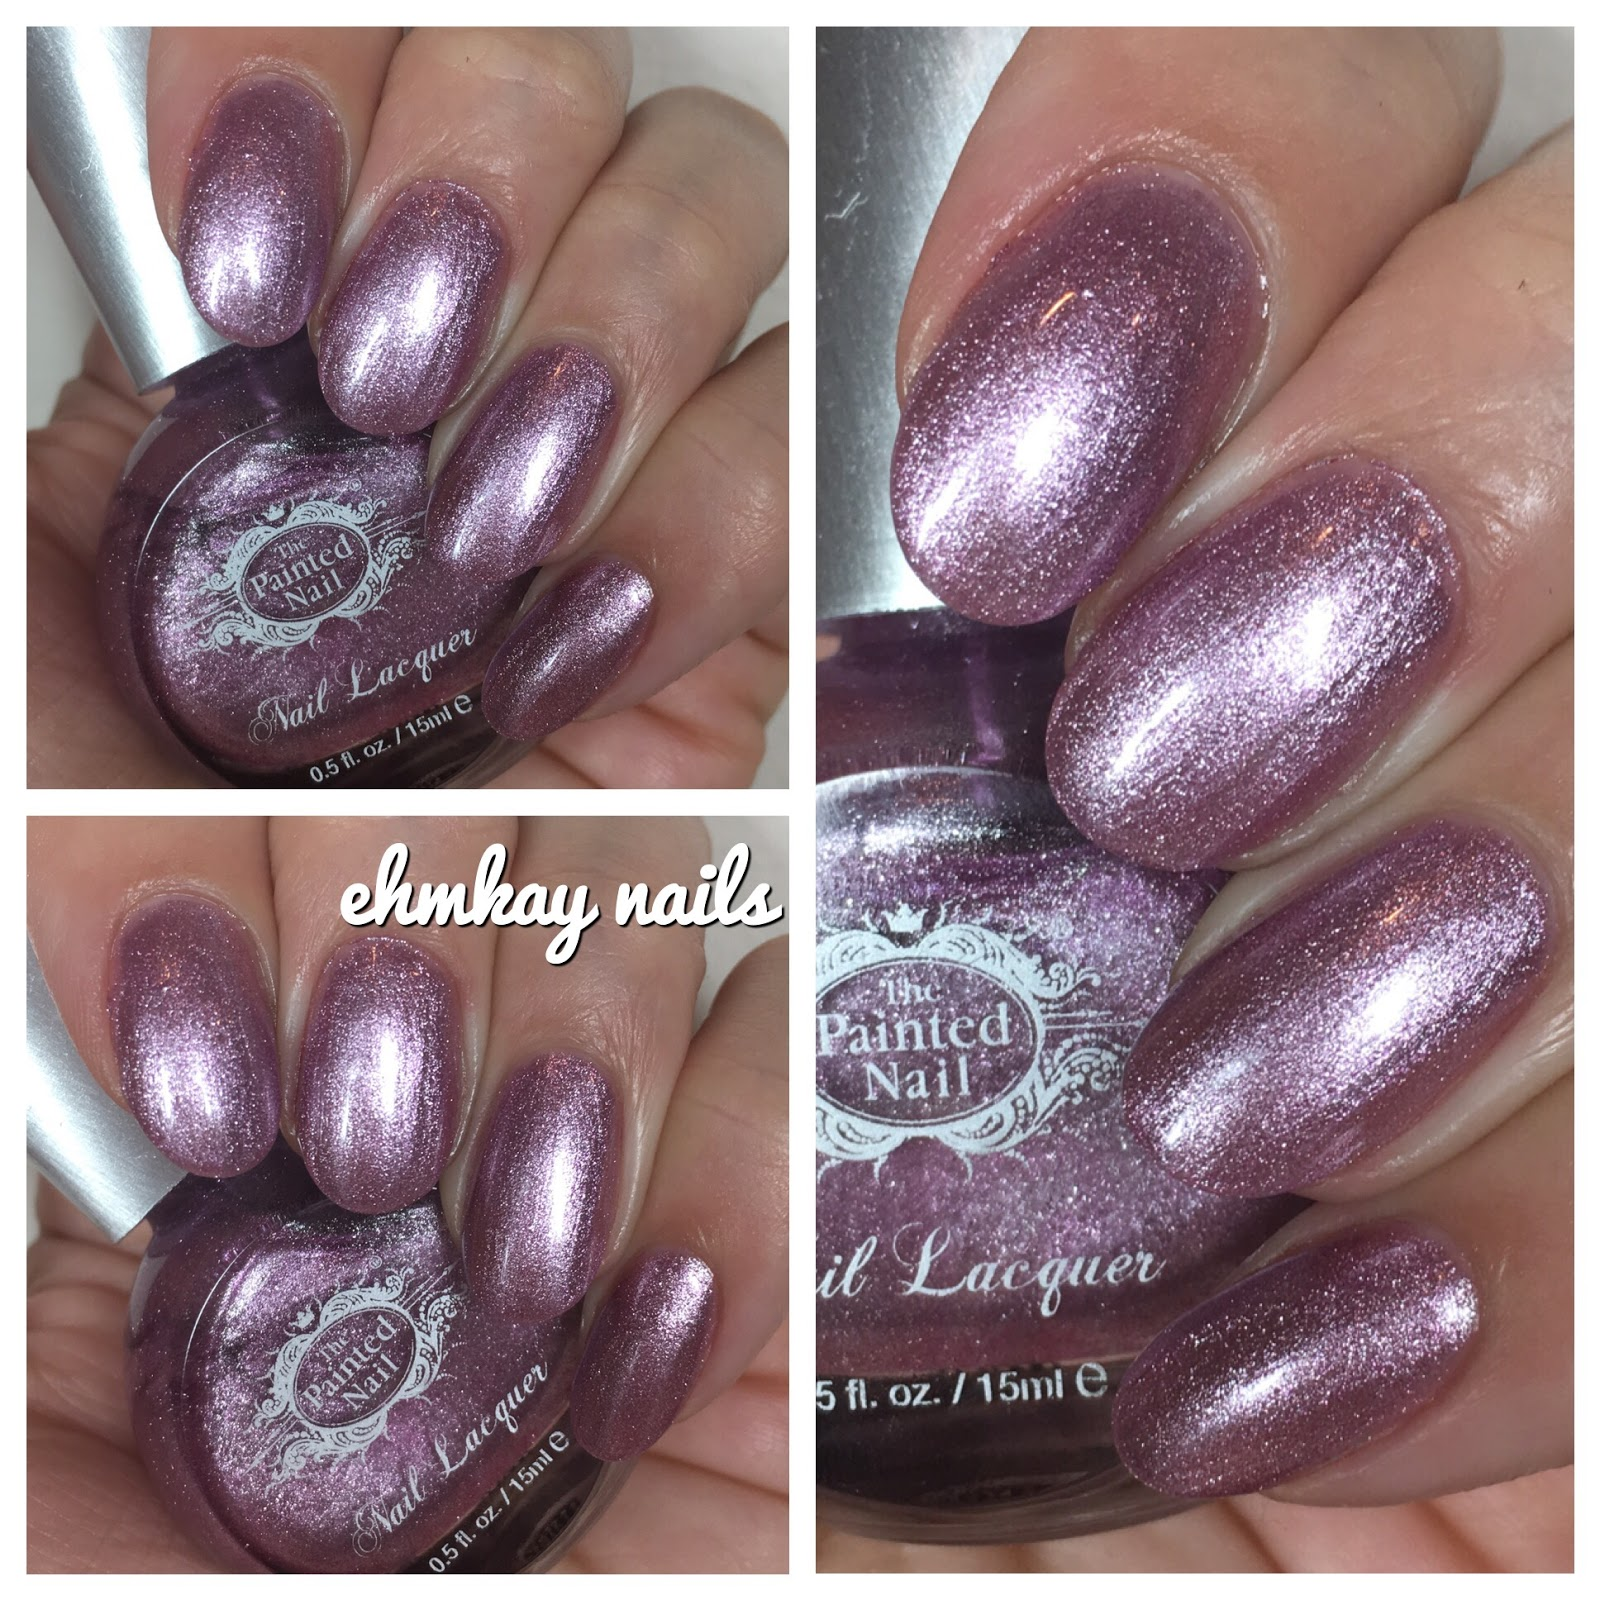 ehmkay nails: The Painted Nail Purple-Pink Shimmer